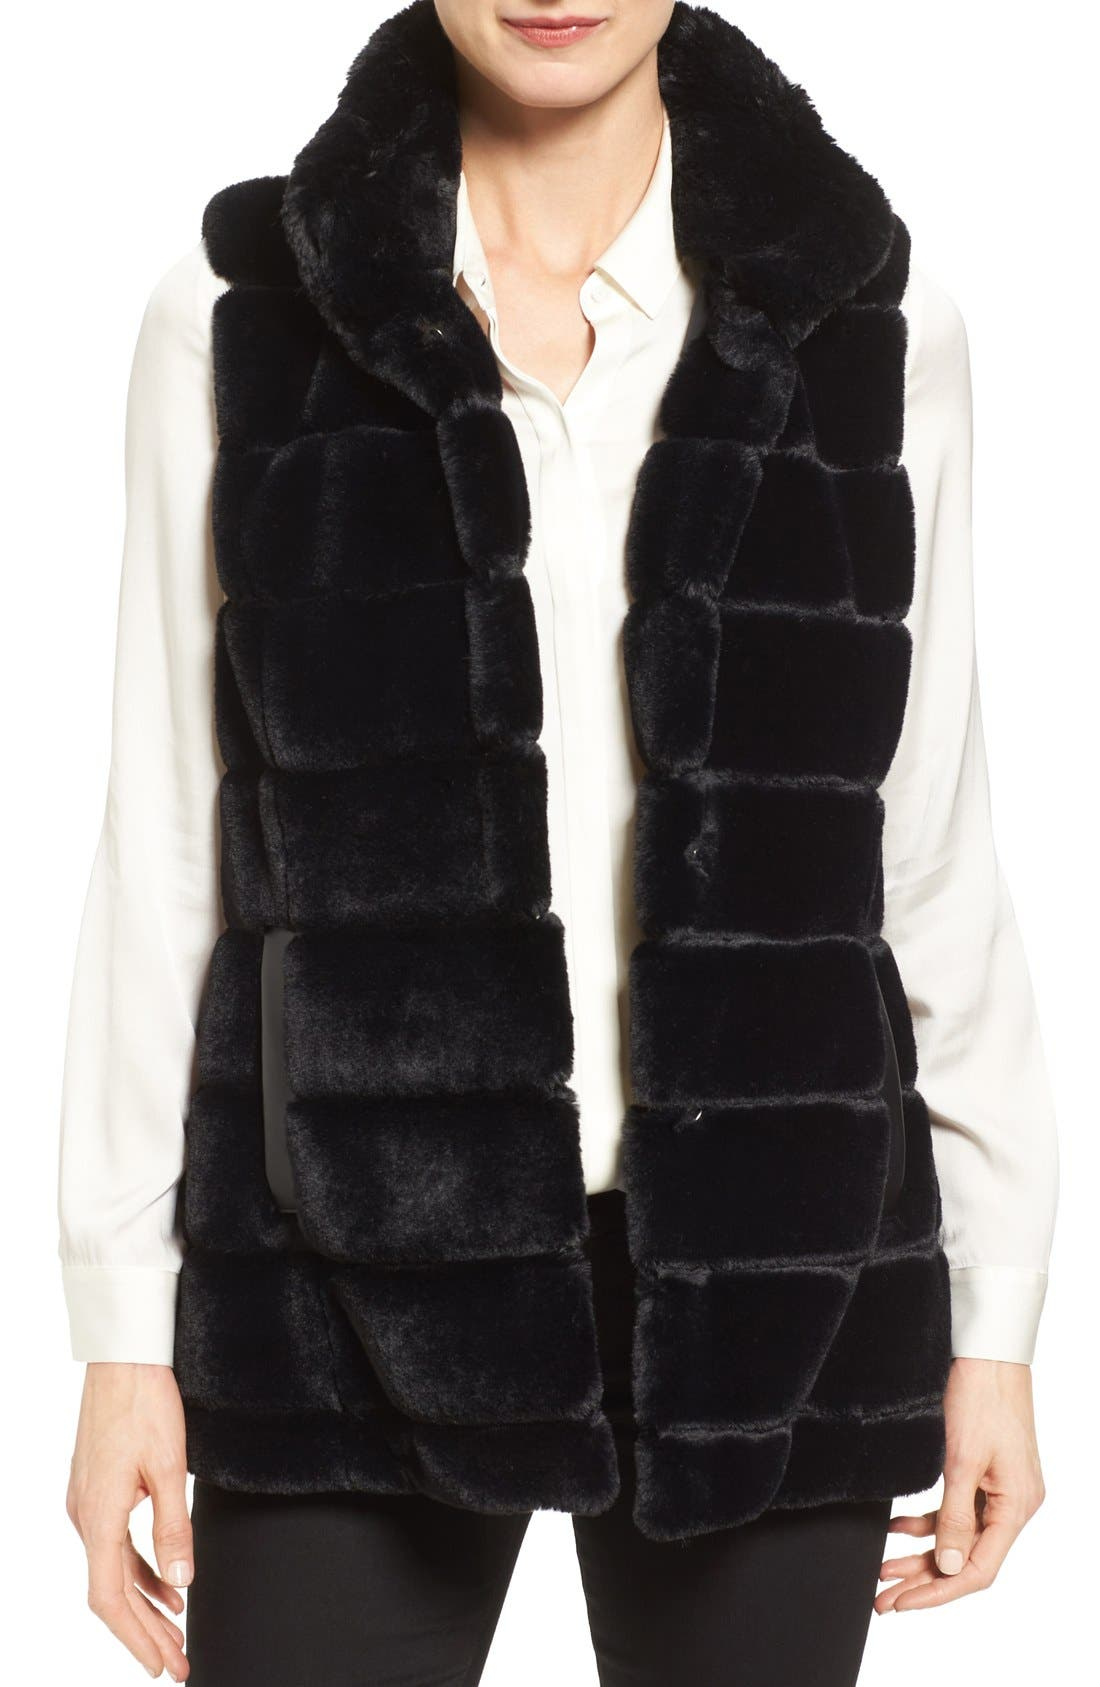 Alternate Image 1 Selected - Jones New York Reversible Faux Fur Vest